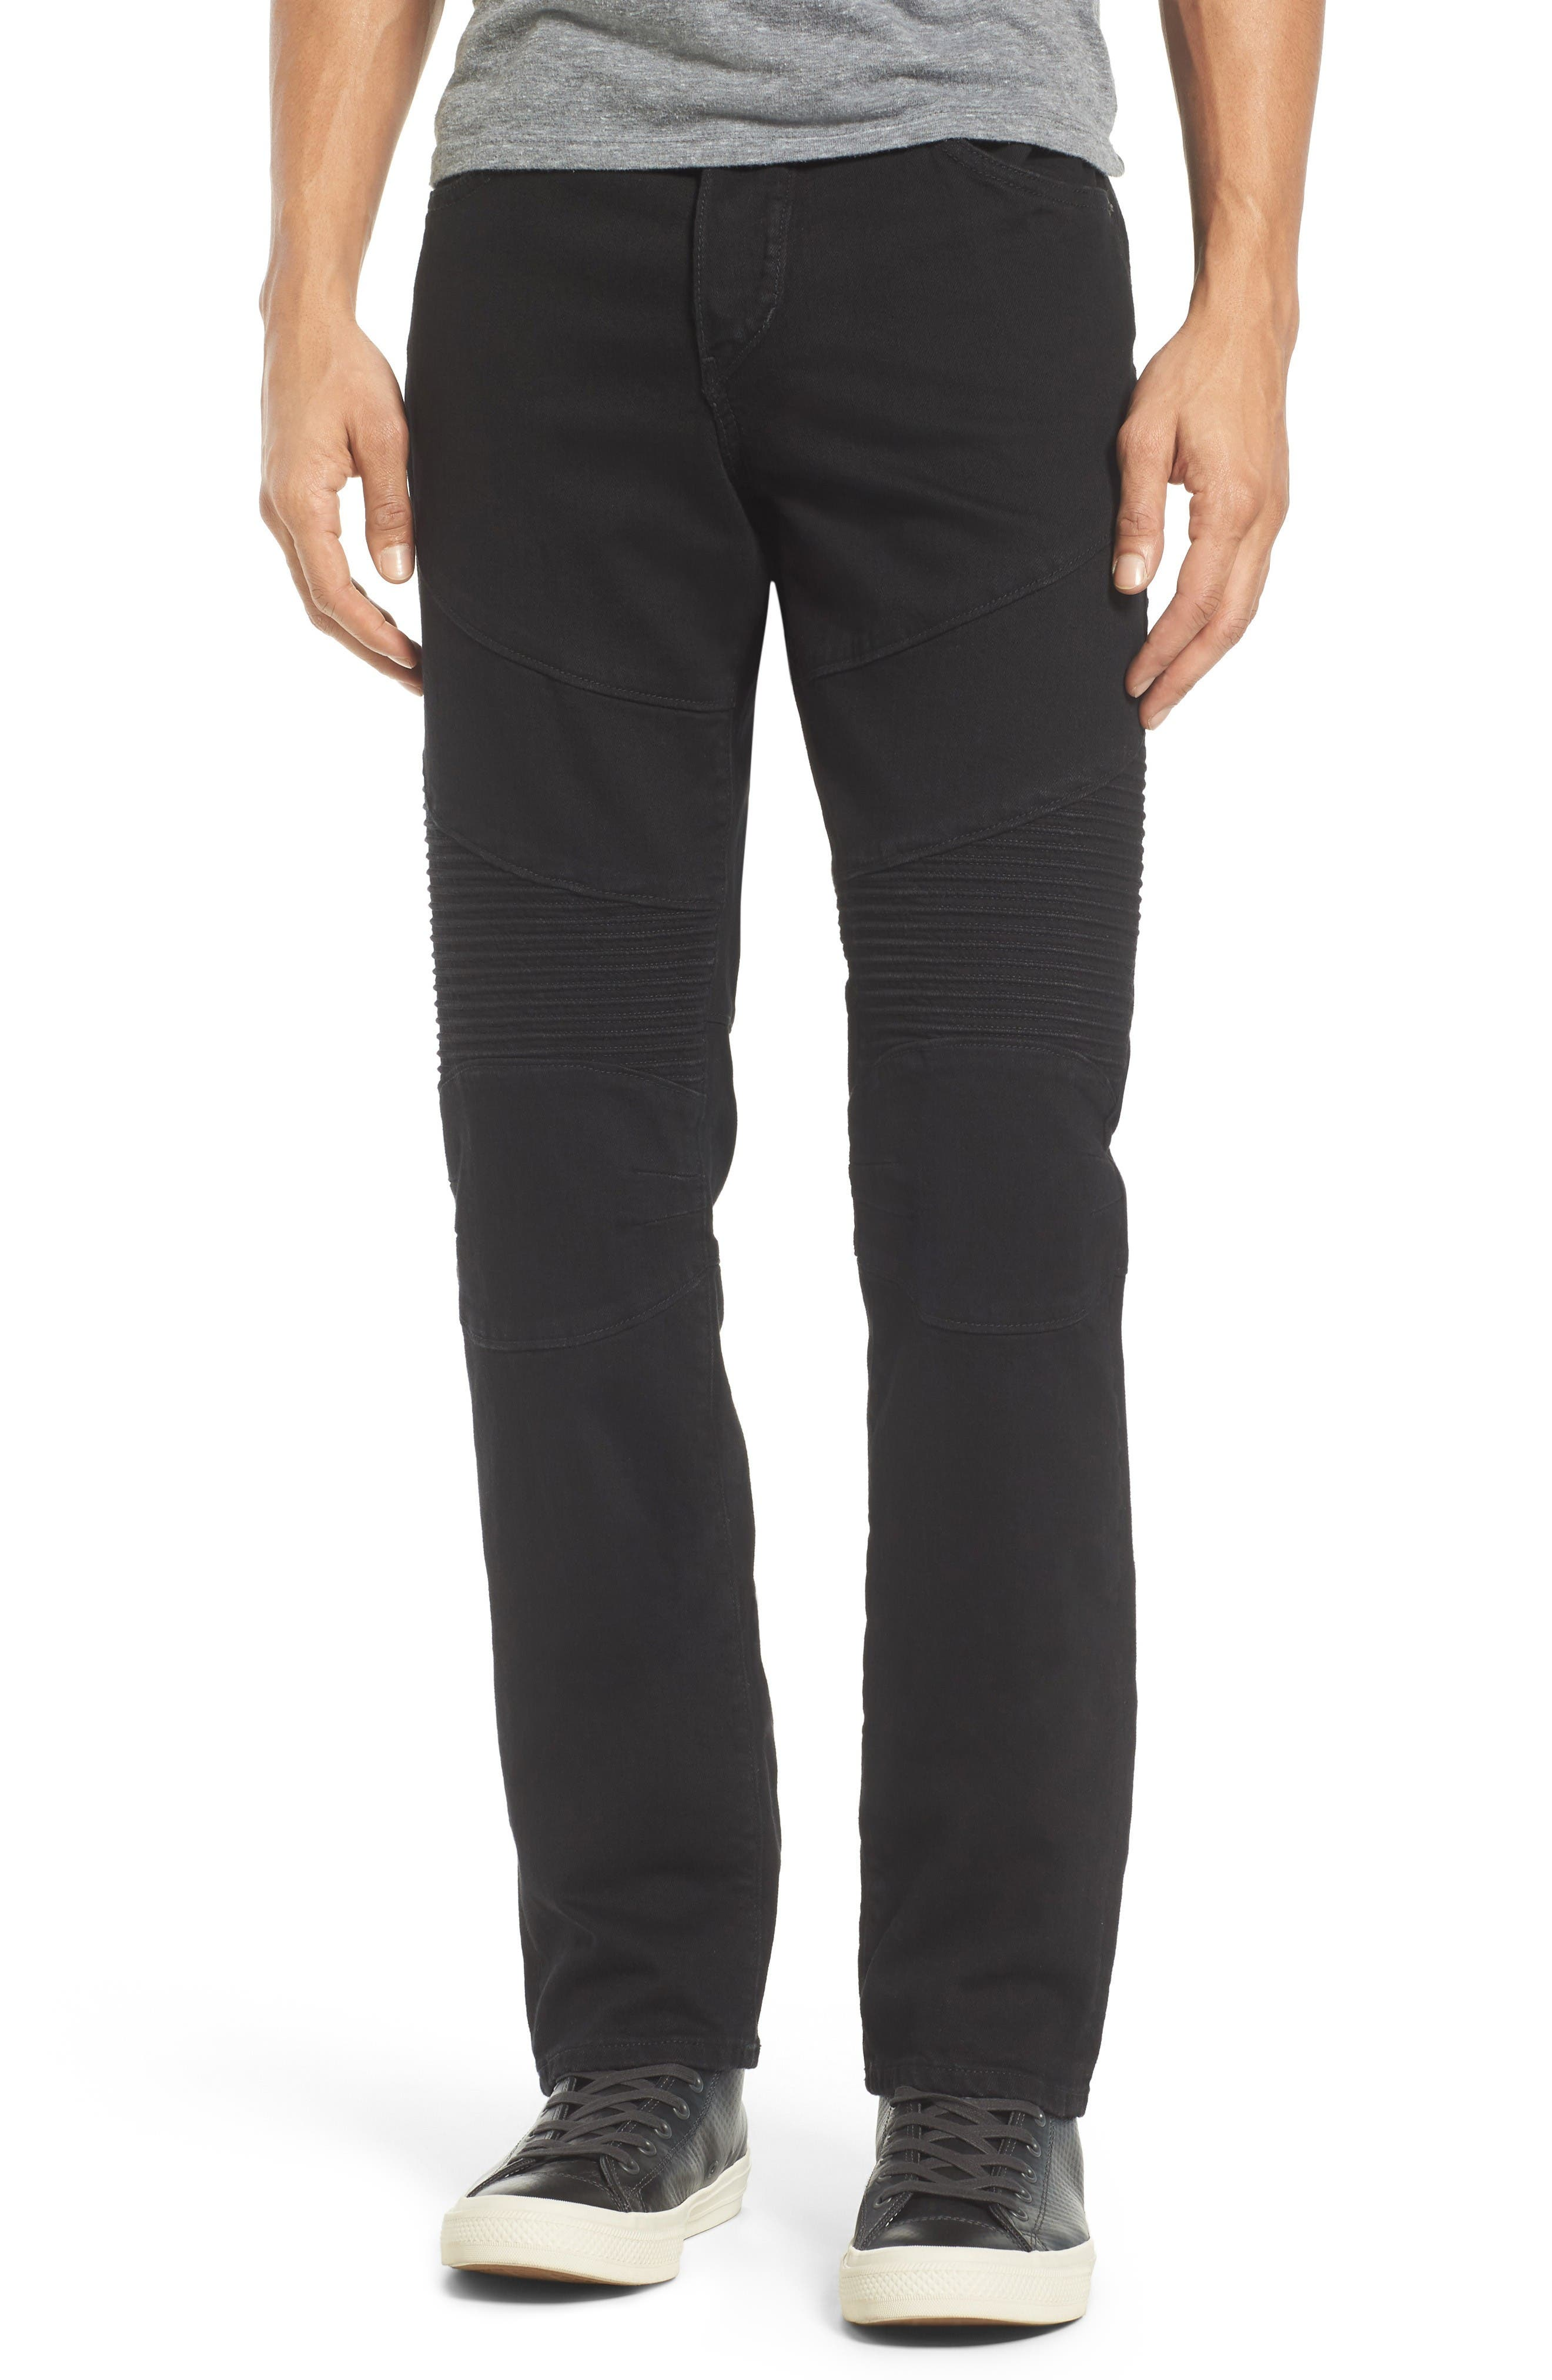 True Religion Brand Jeans Rocco Skinny Fit Jeans (2SB Rinse Black) (Regular & Big)